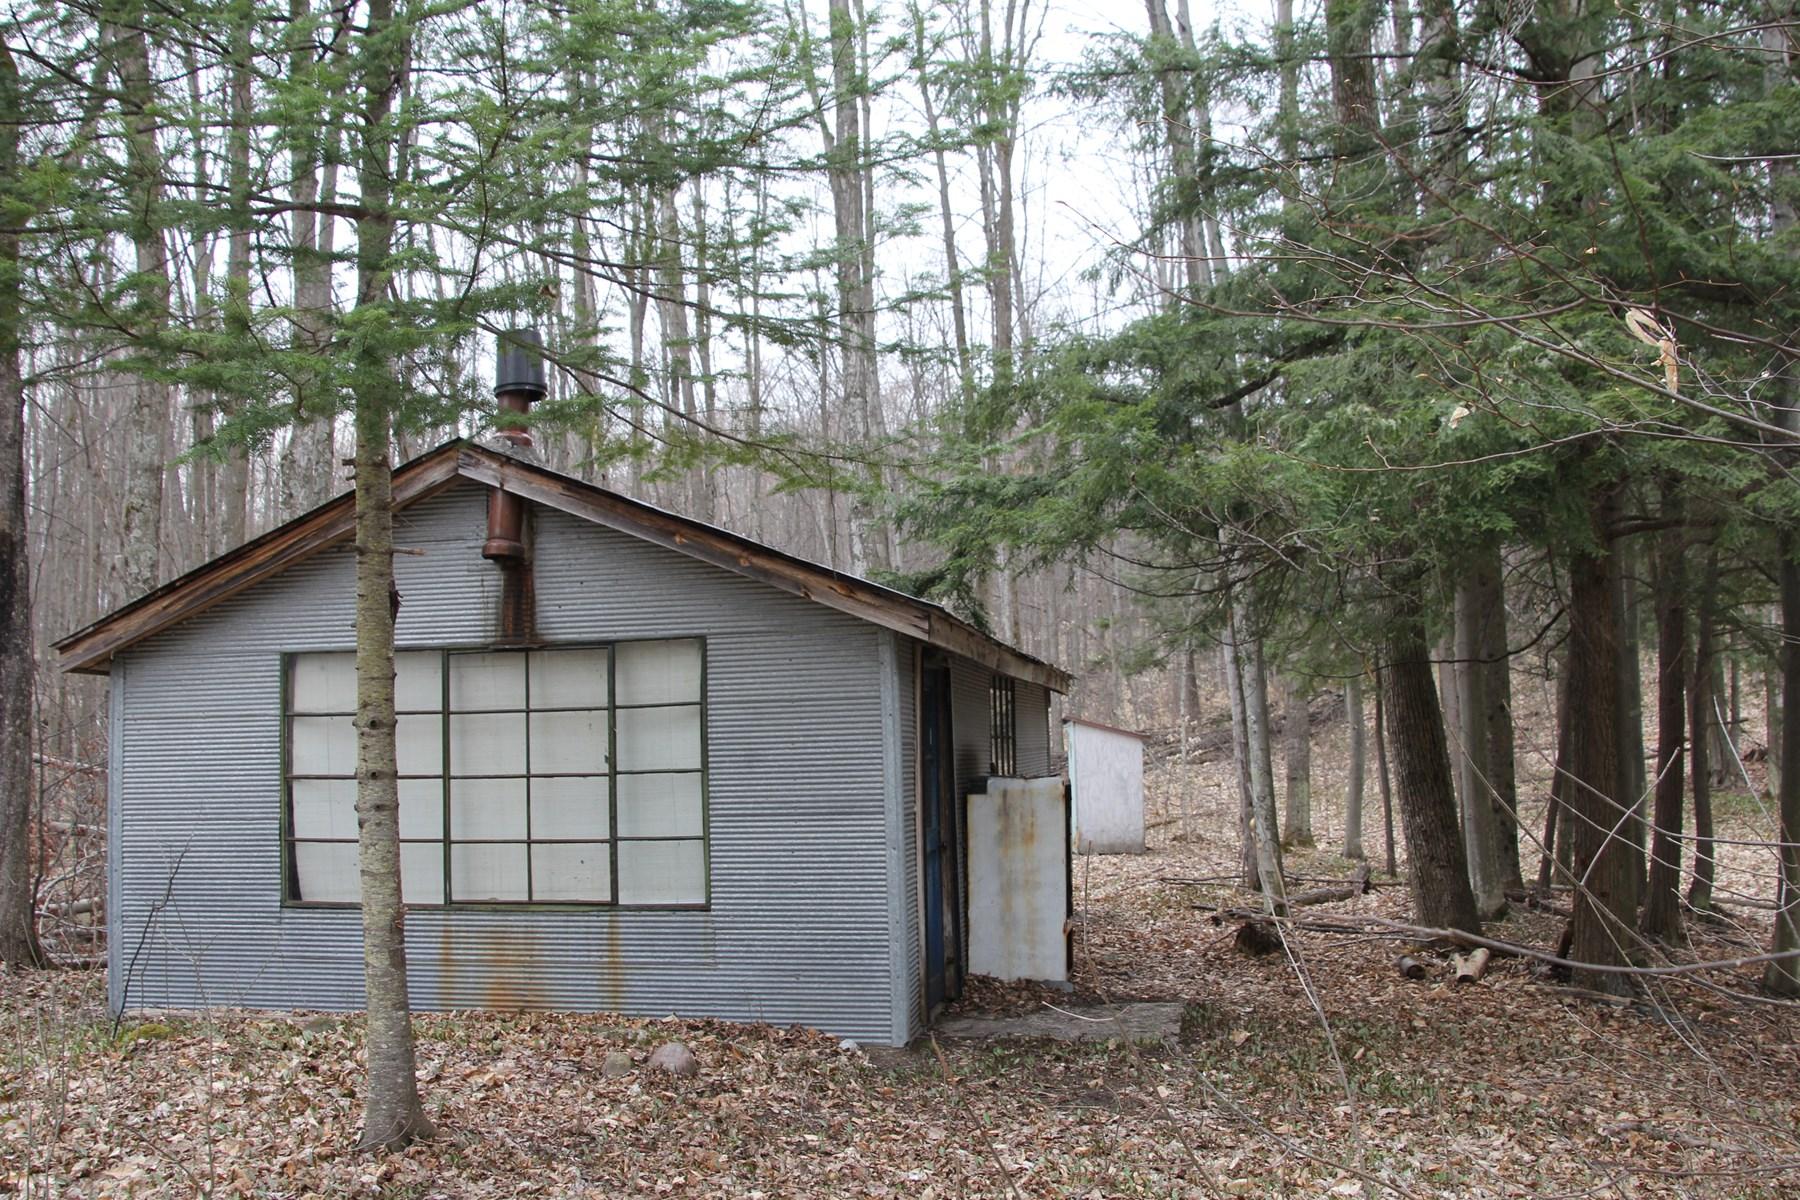 Vacant Land - 40 Acres For Sale Atlanta Michigan